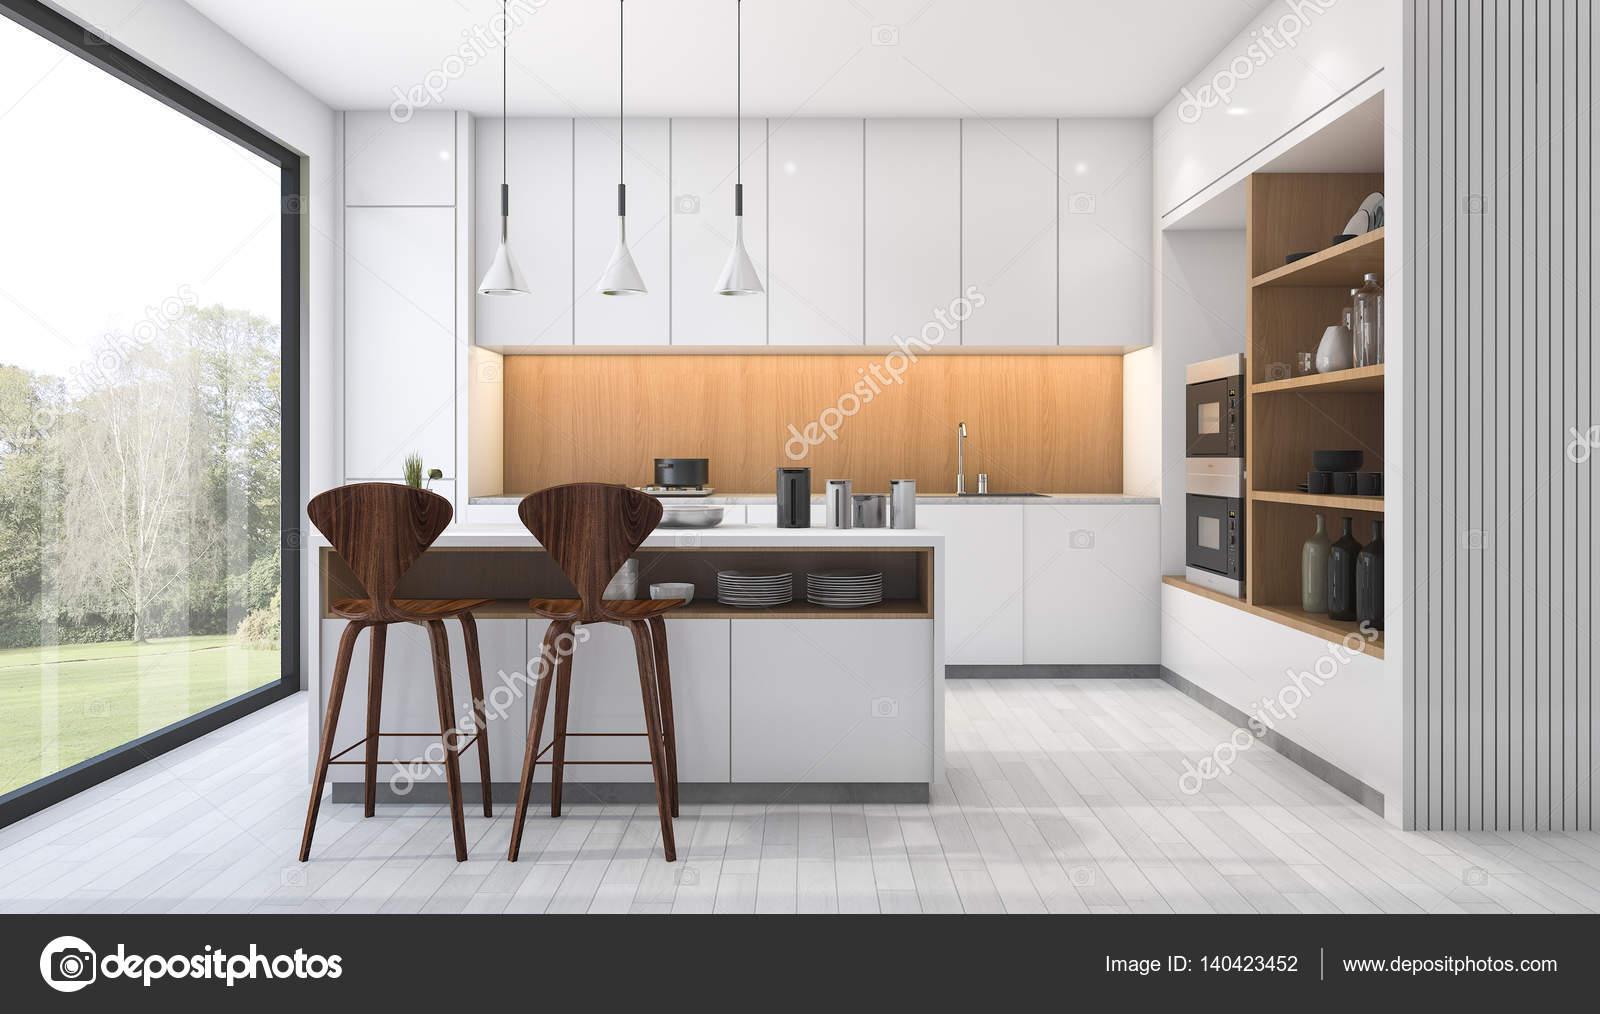 Keuken Moderne Bar : D rendering witte moderne keuken met bar in de omgeving van